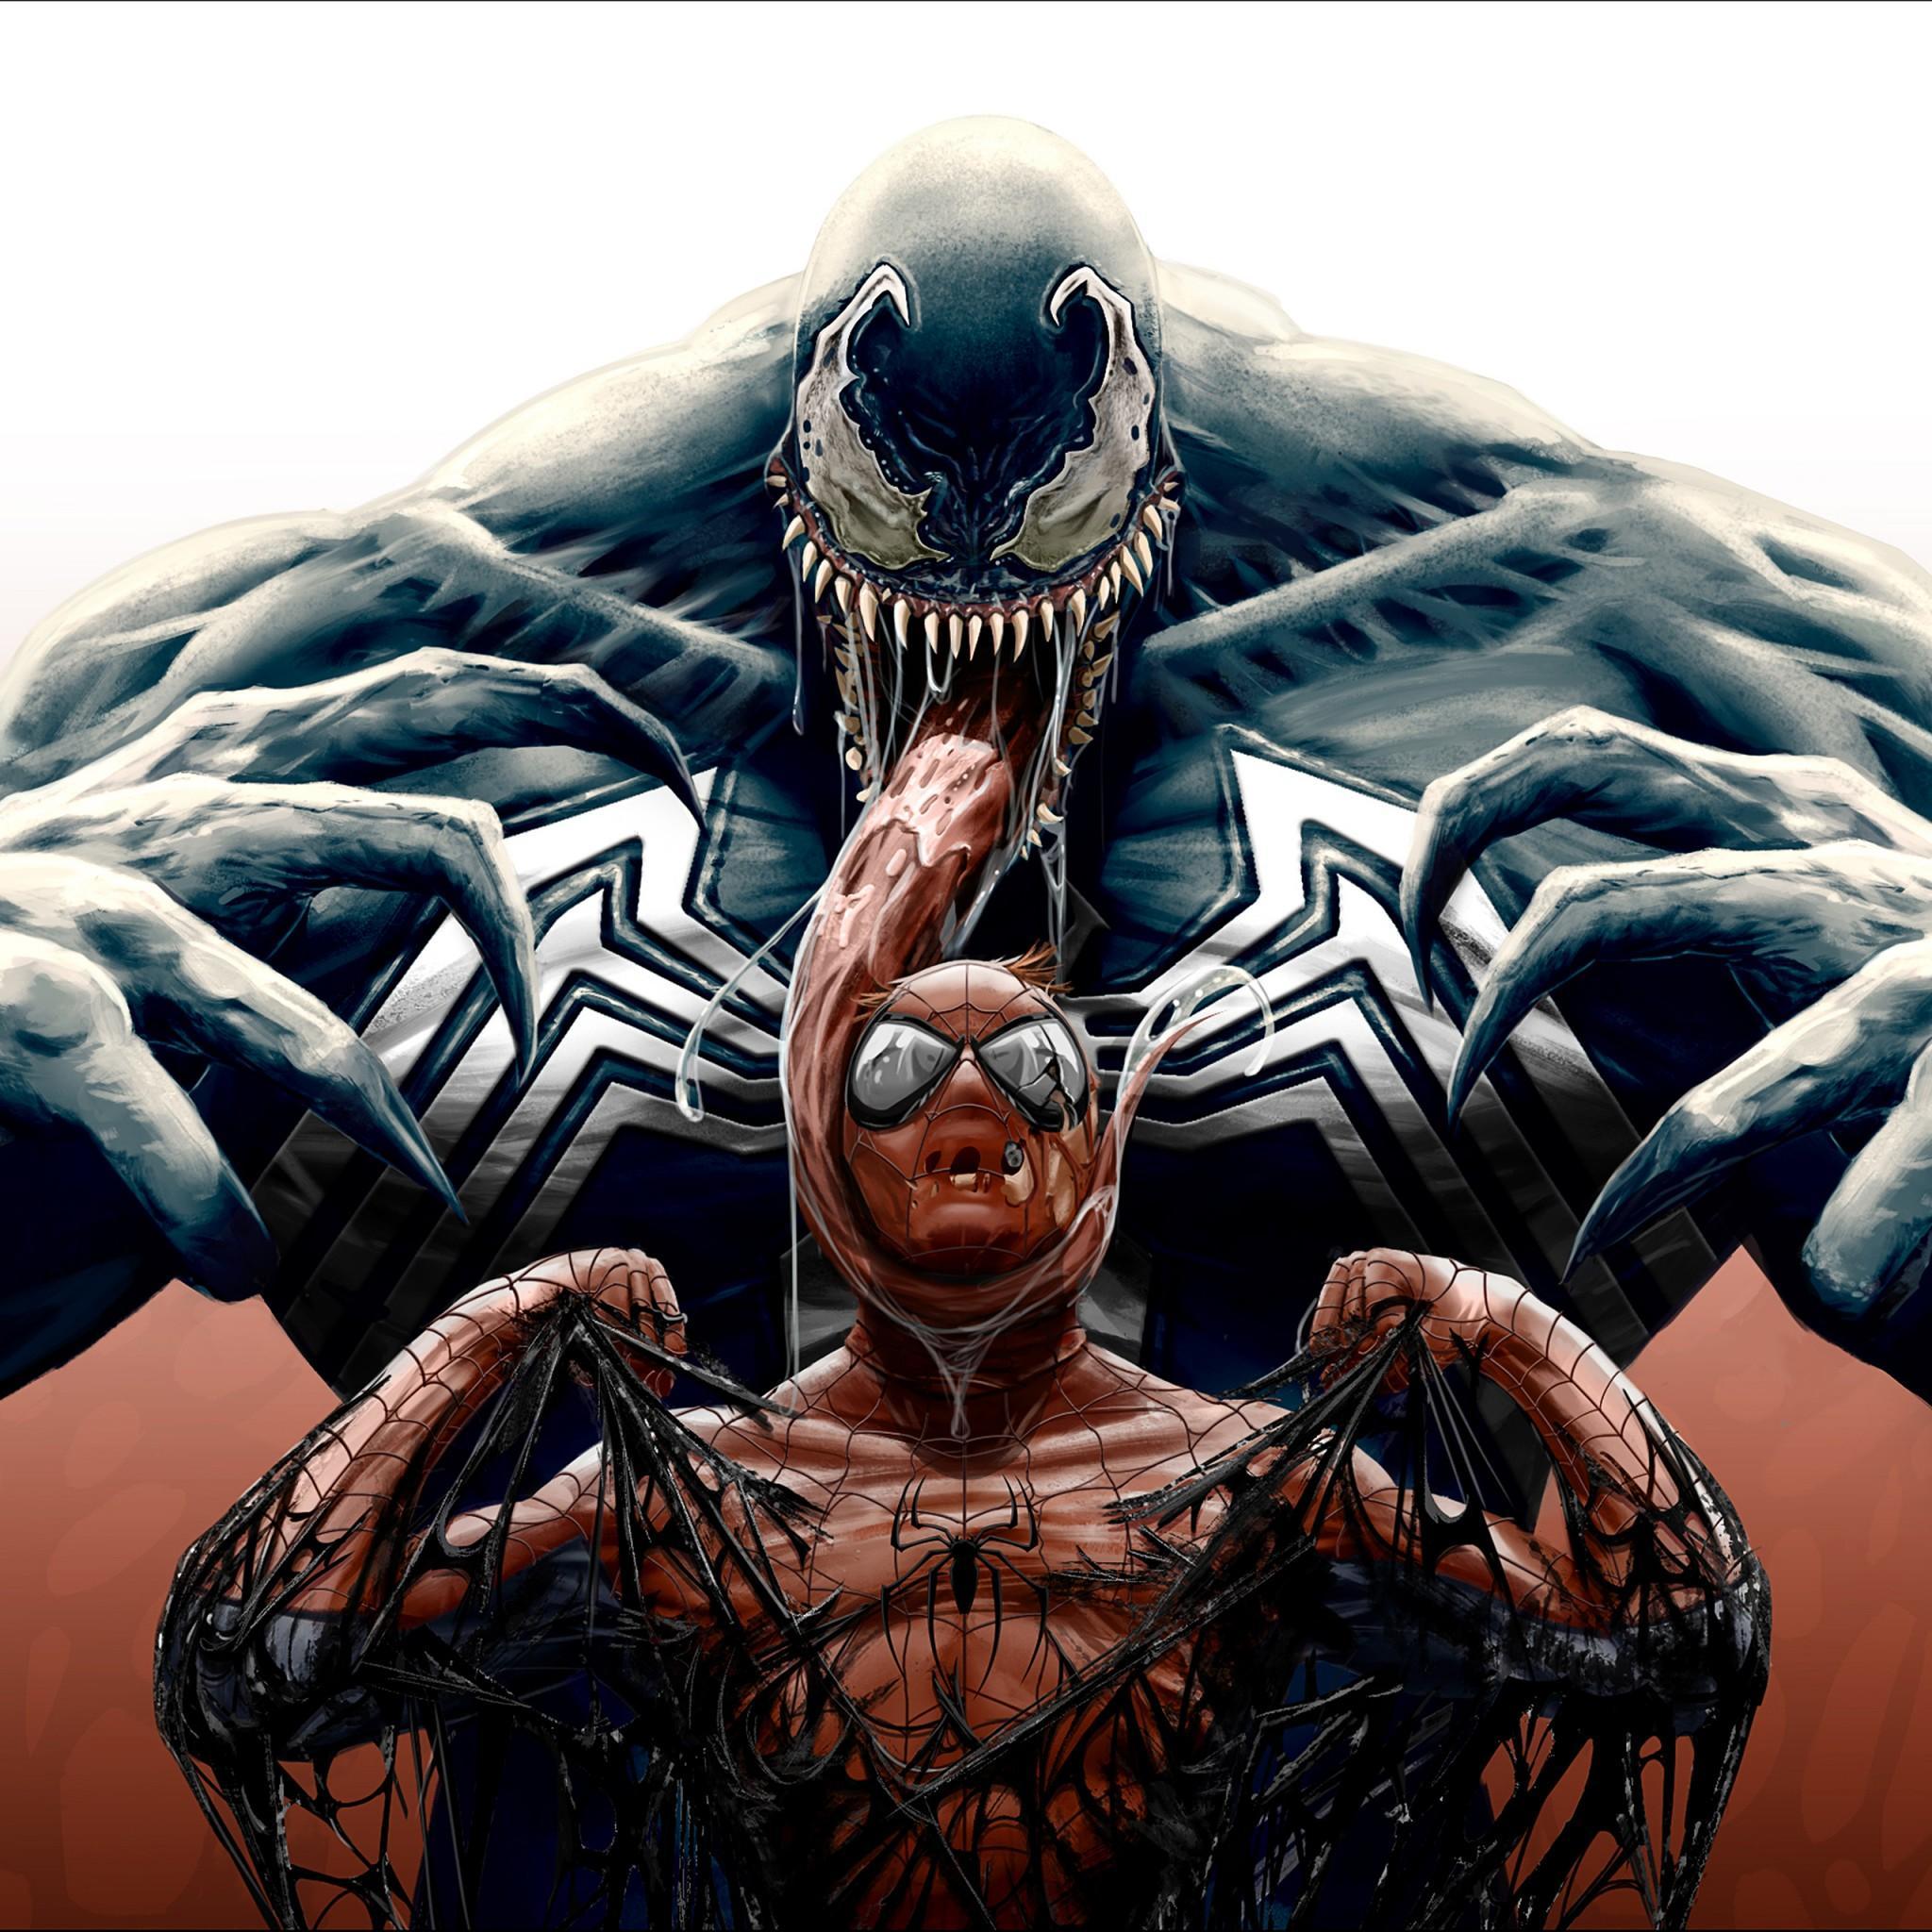 Venom Amoled 4k Wallpapers - Wallpaper Cave